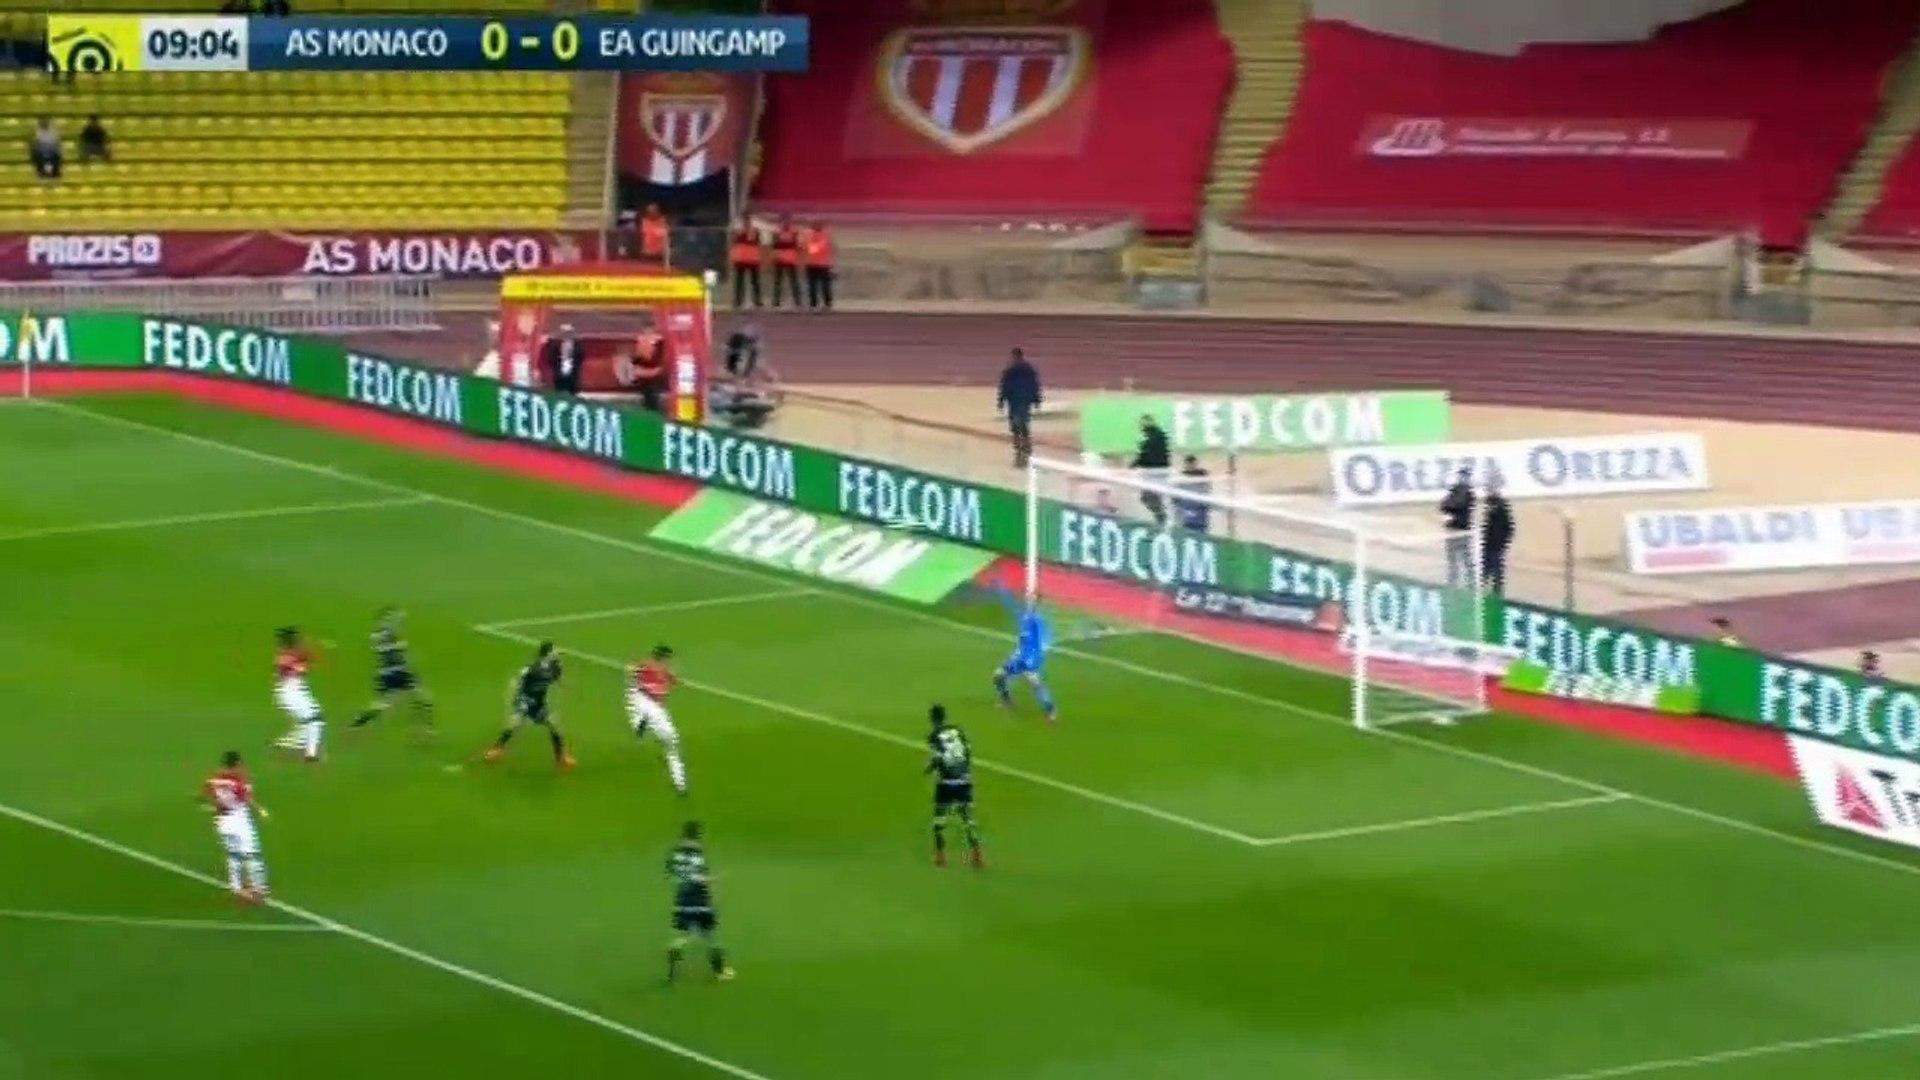 Guido Carrillo Goal HD - AS Monaco 1 - 0 Guingamp - 04.11.2017 (Full Replay)